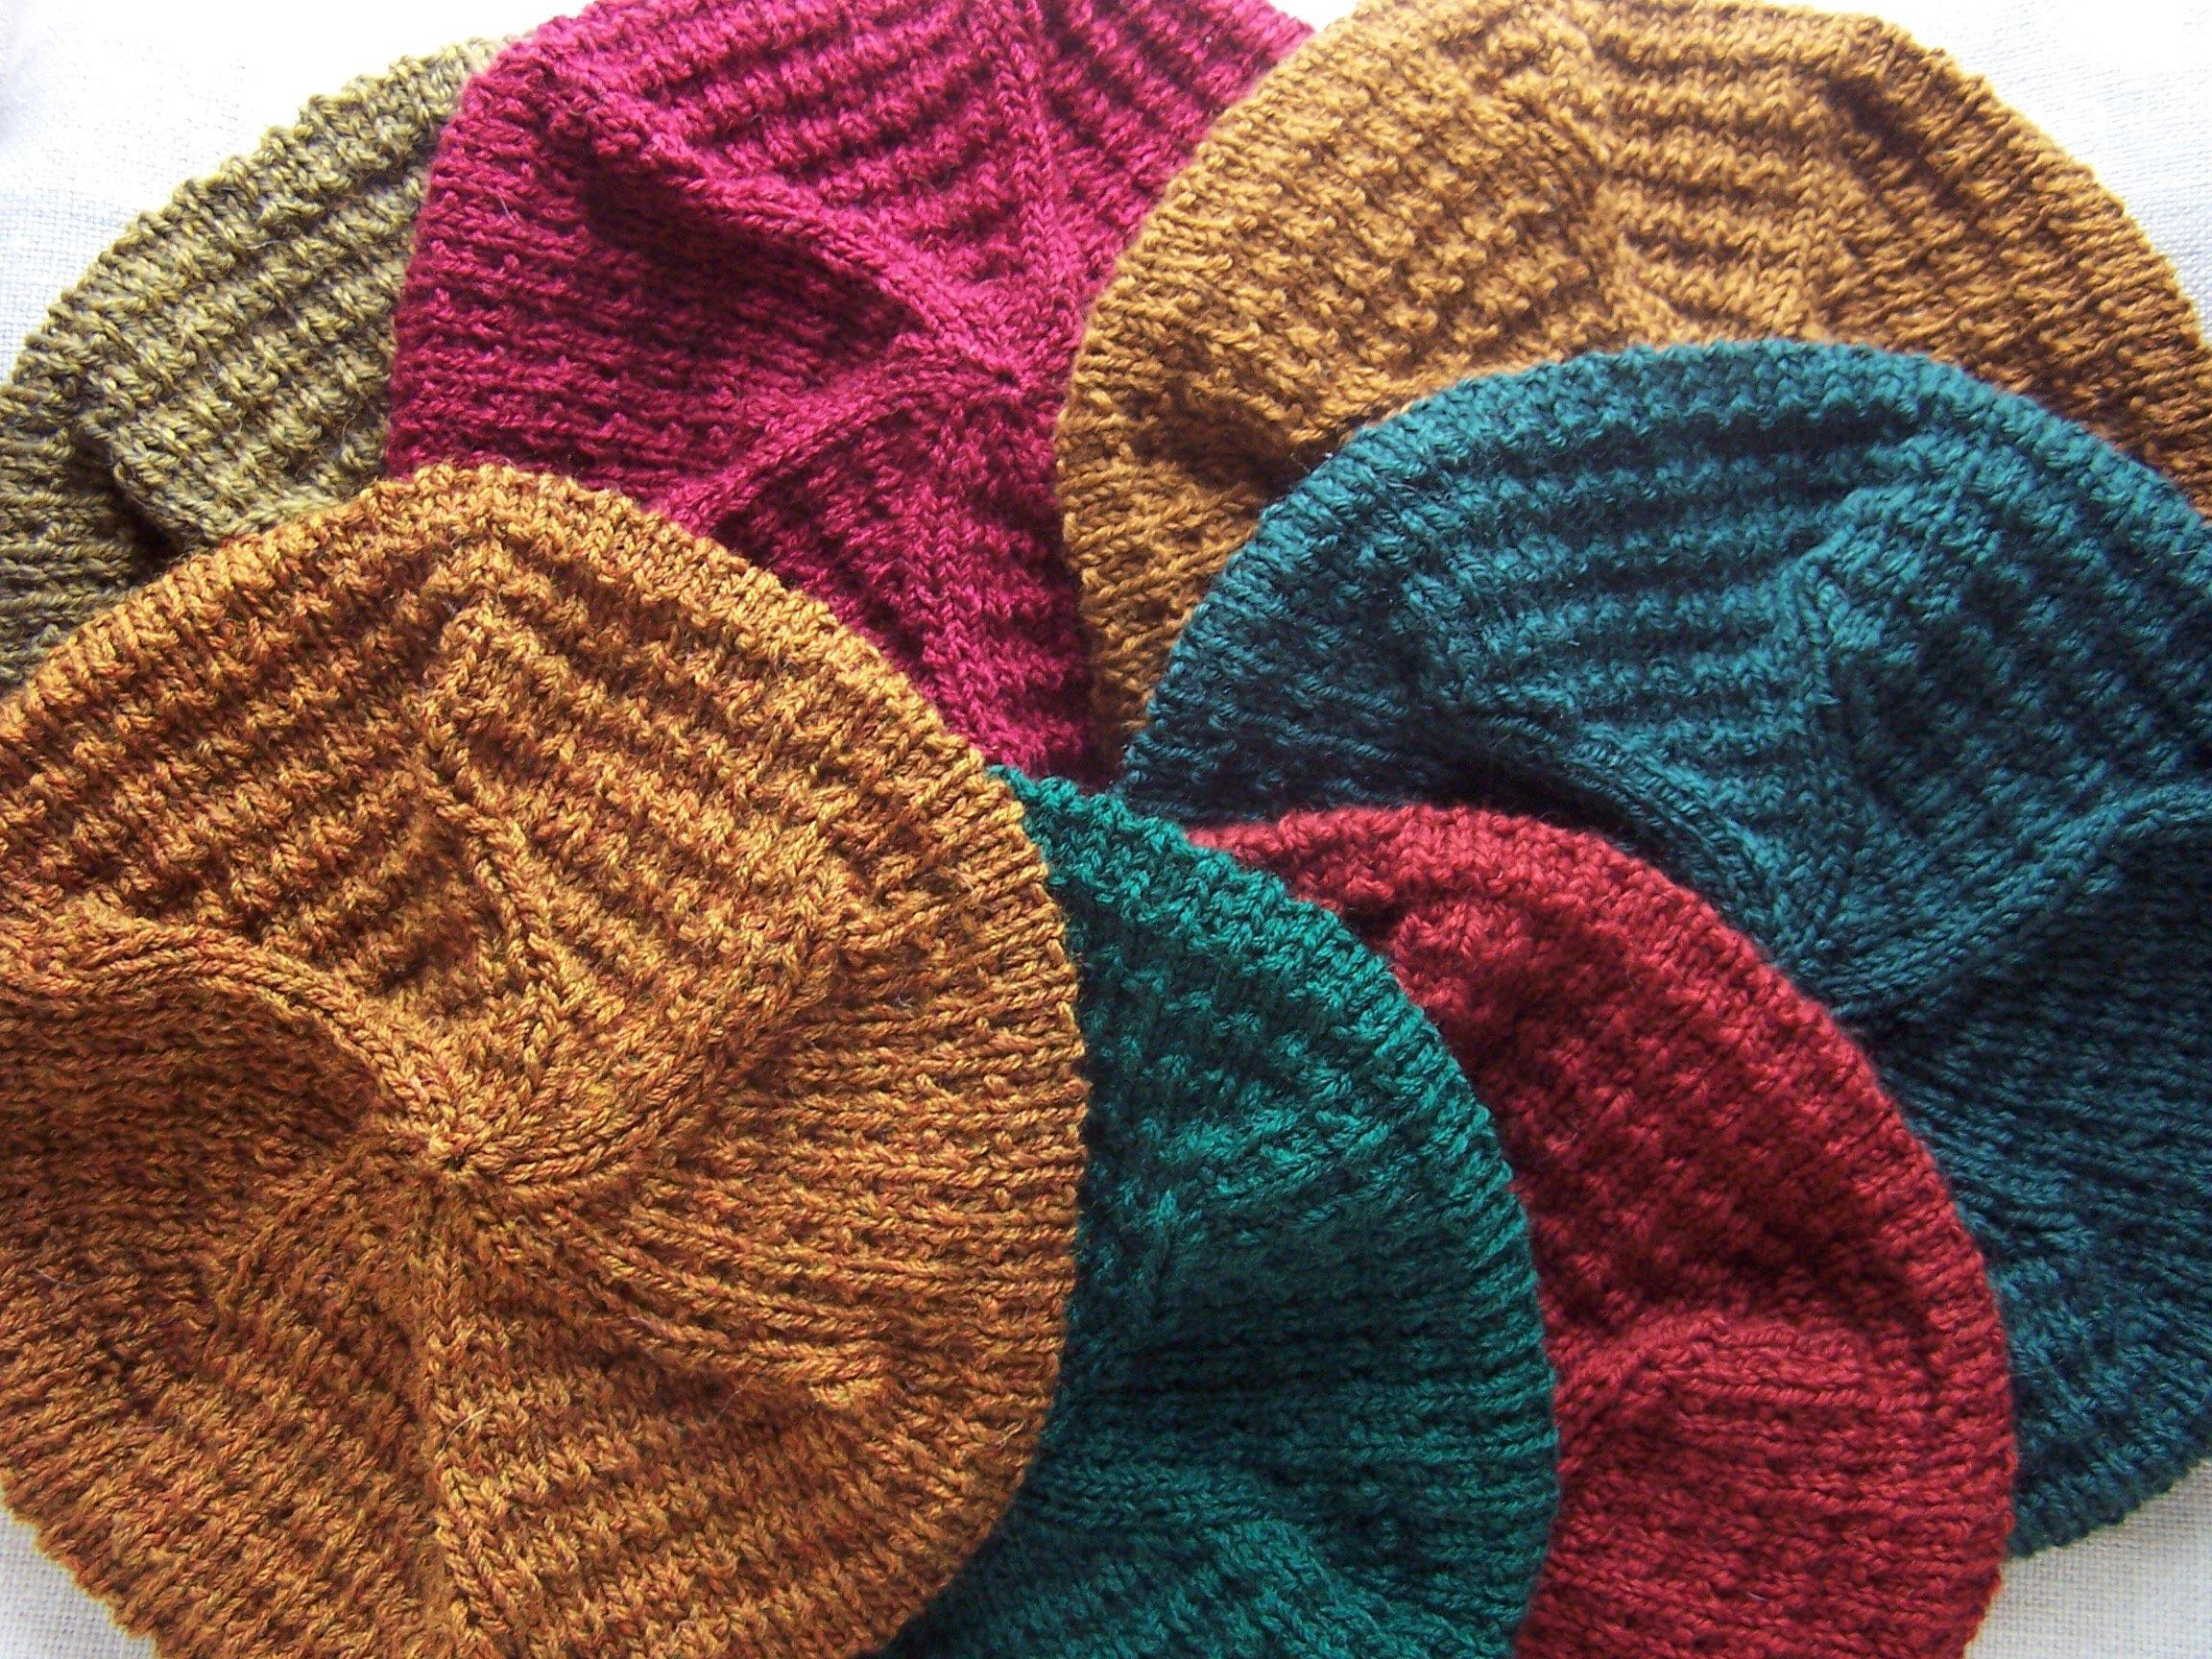 Pot holders according to OMAs art oven cloth Handmade Coralle WHITE handmade crocheted